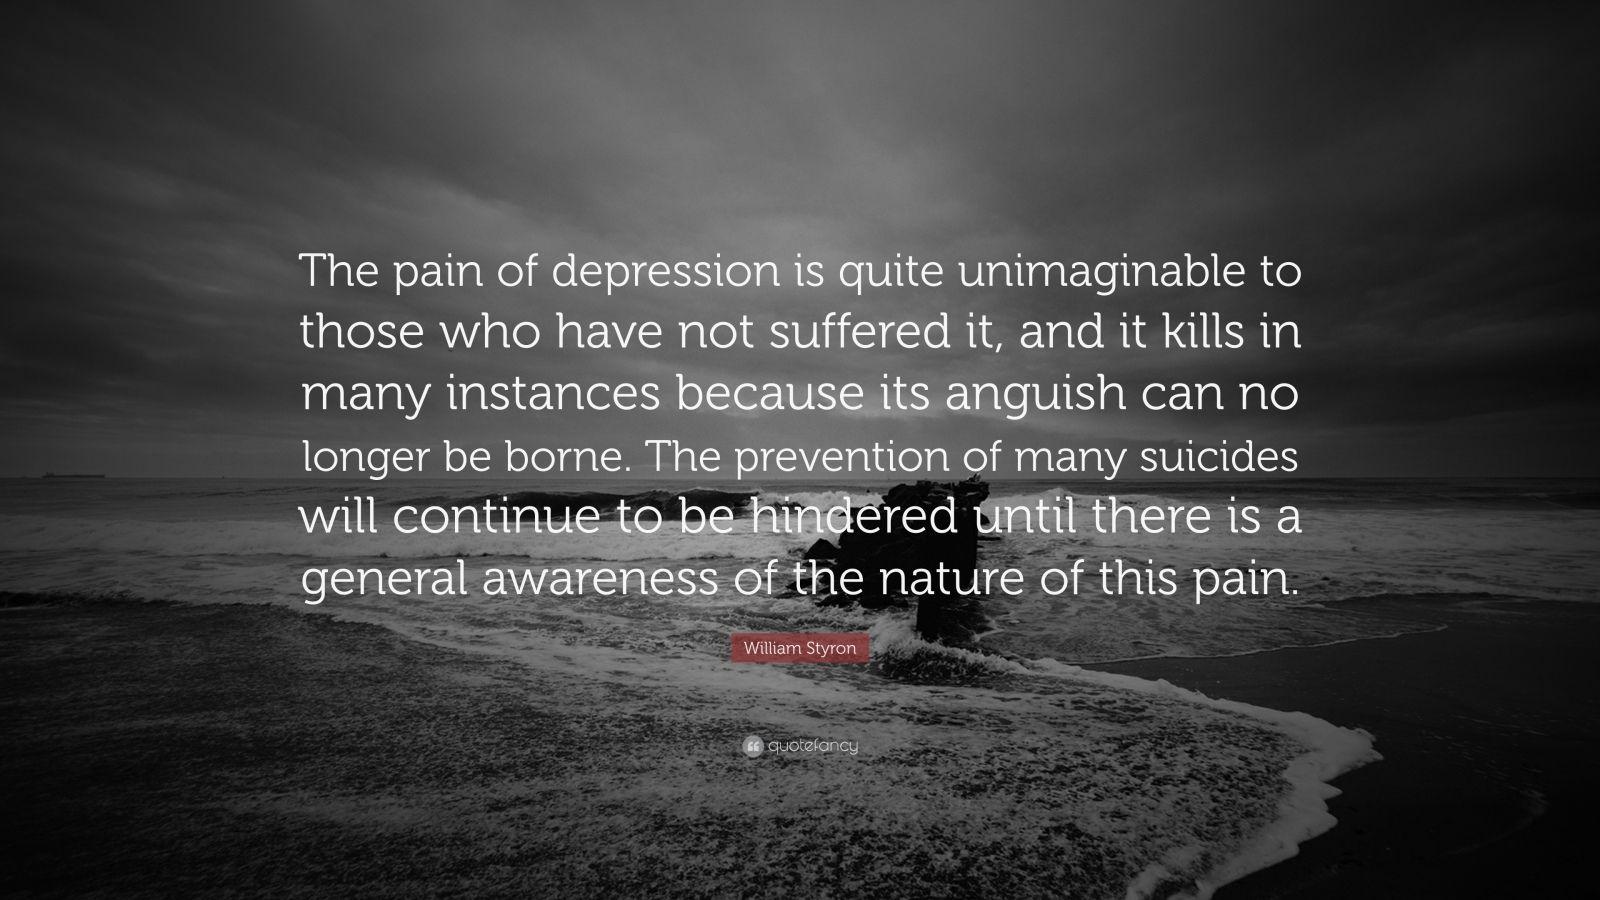 william styron essay on depression 403 Forbidden